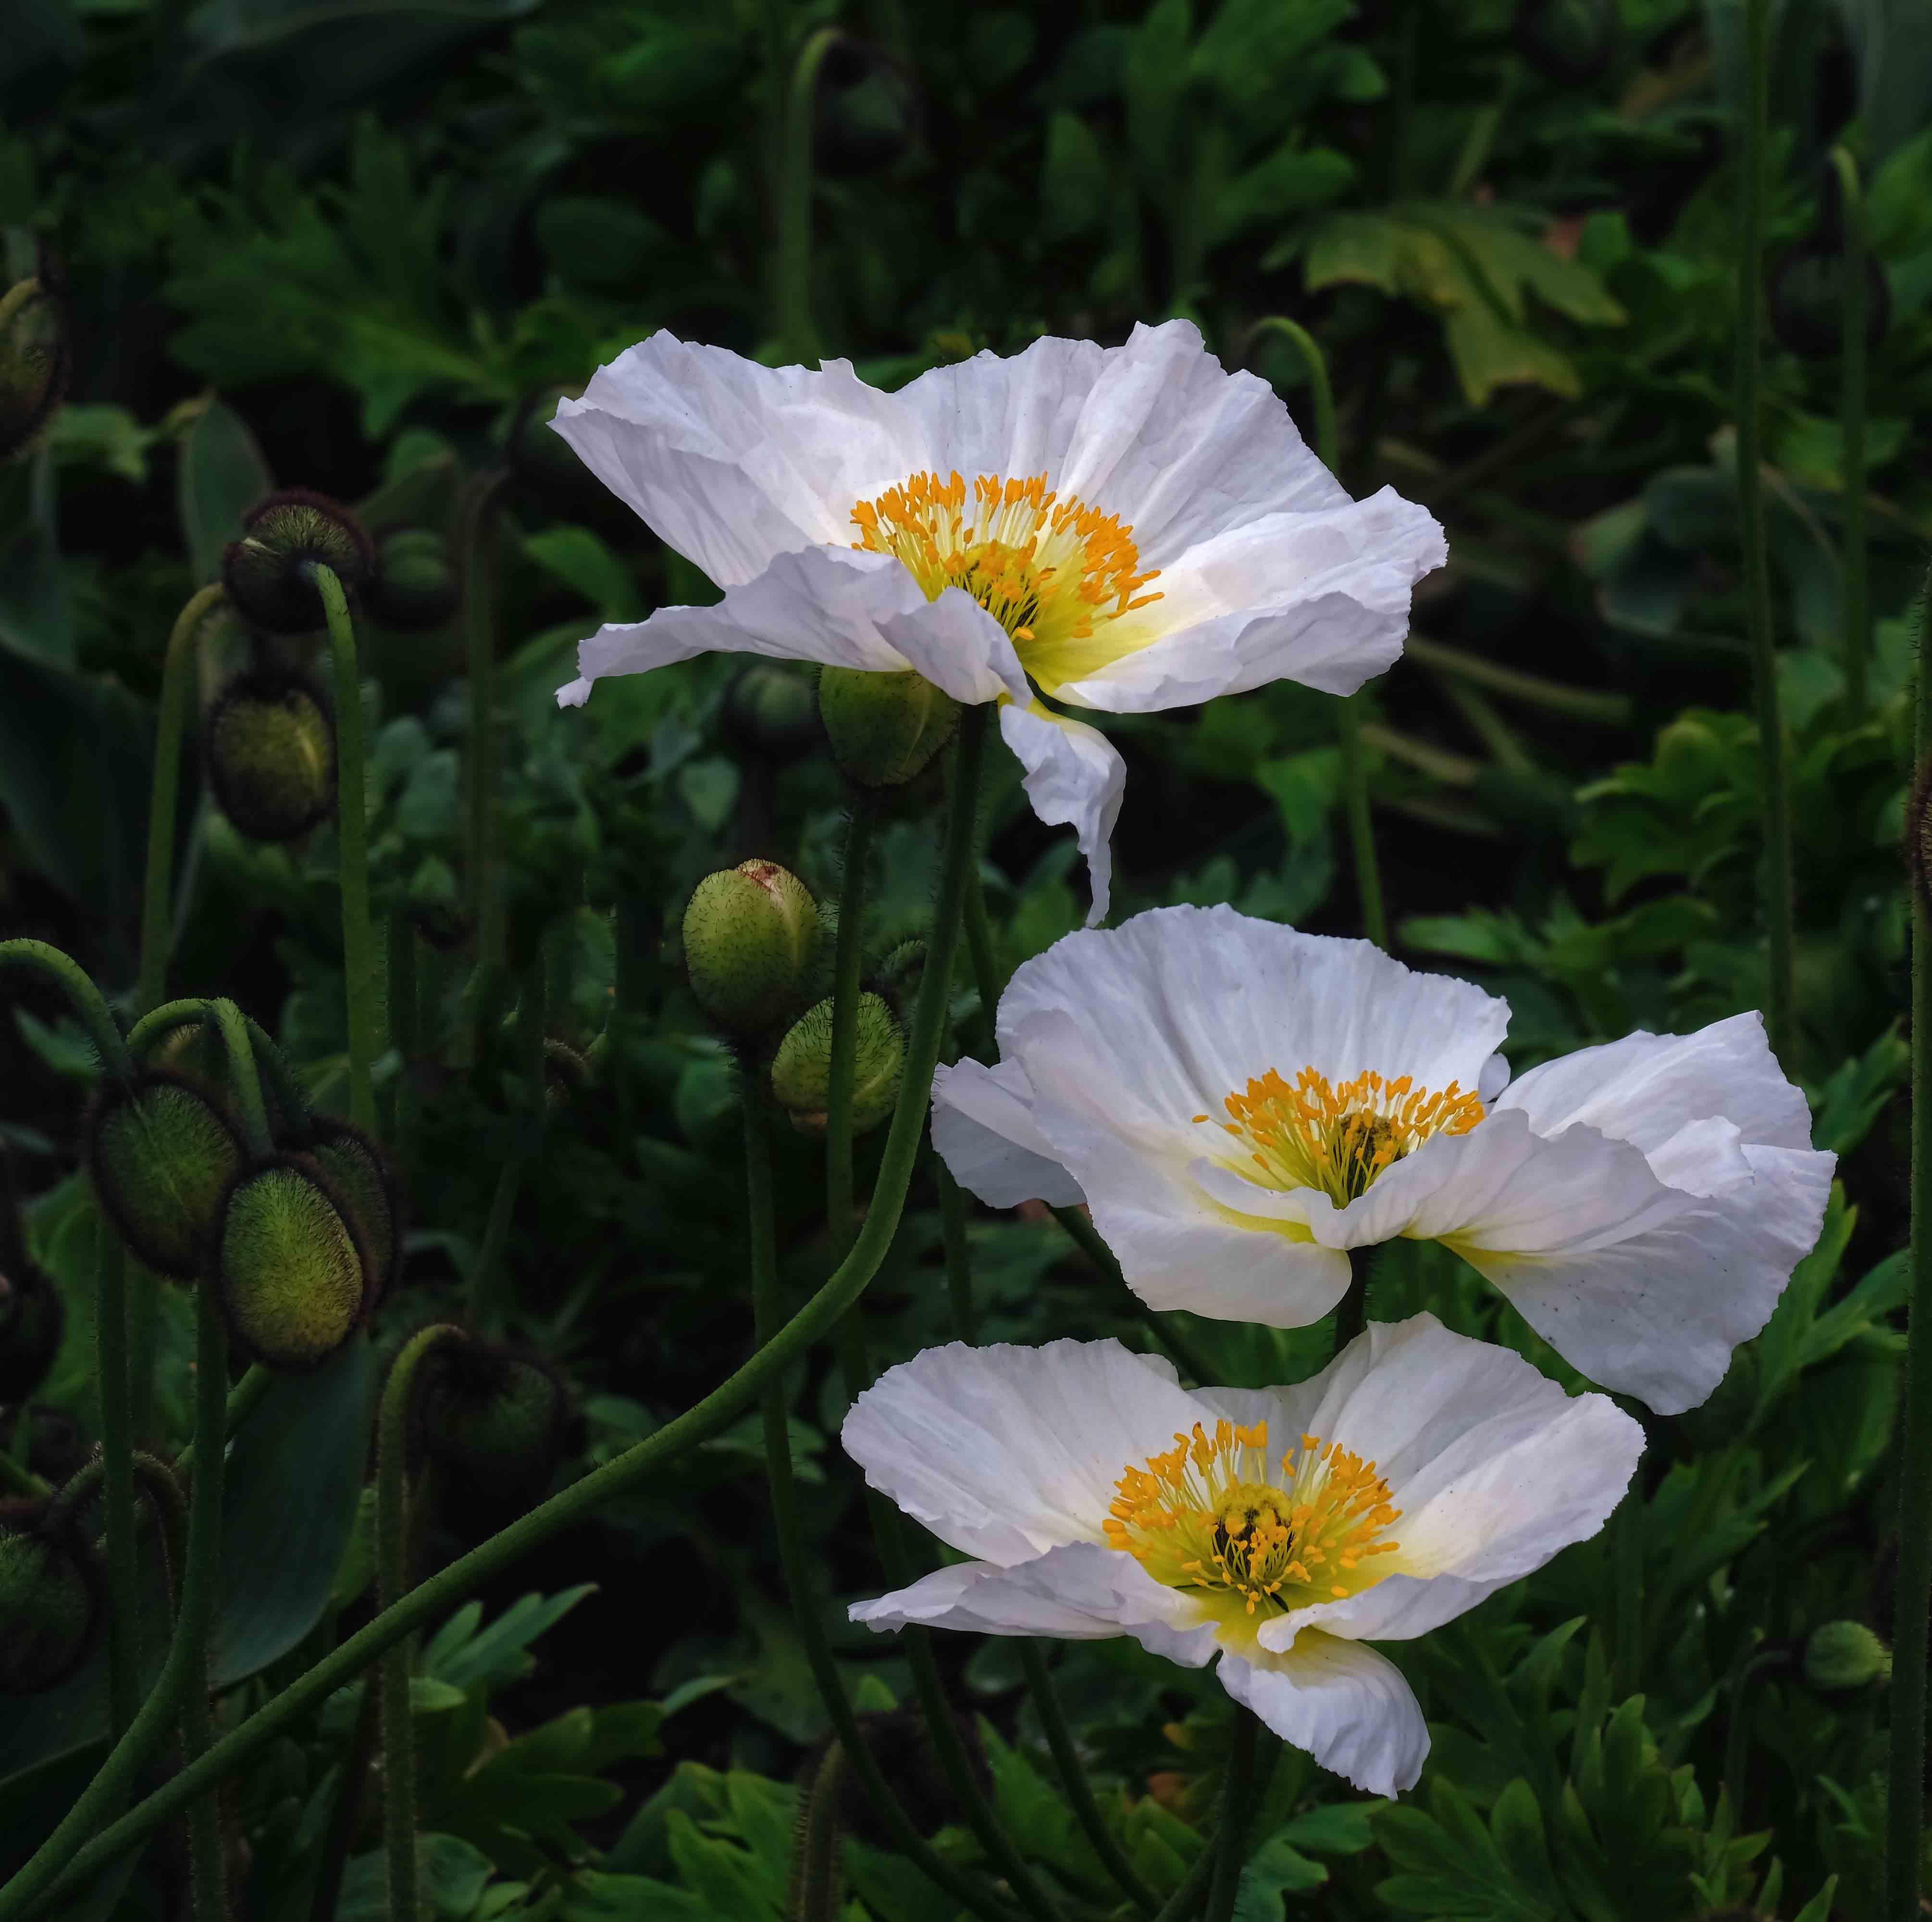 Maureen Pierre: White Poppies